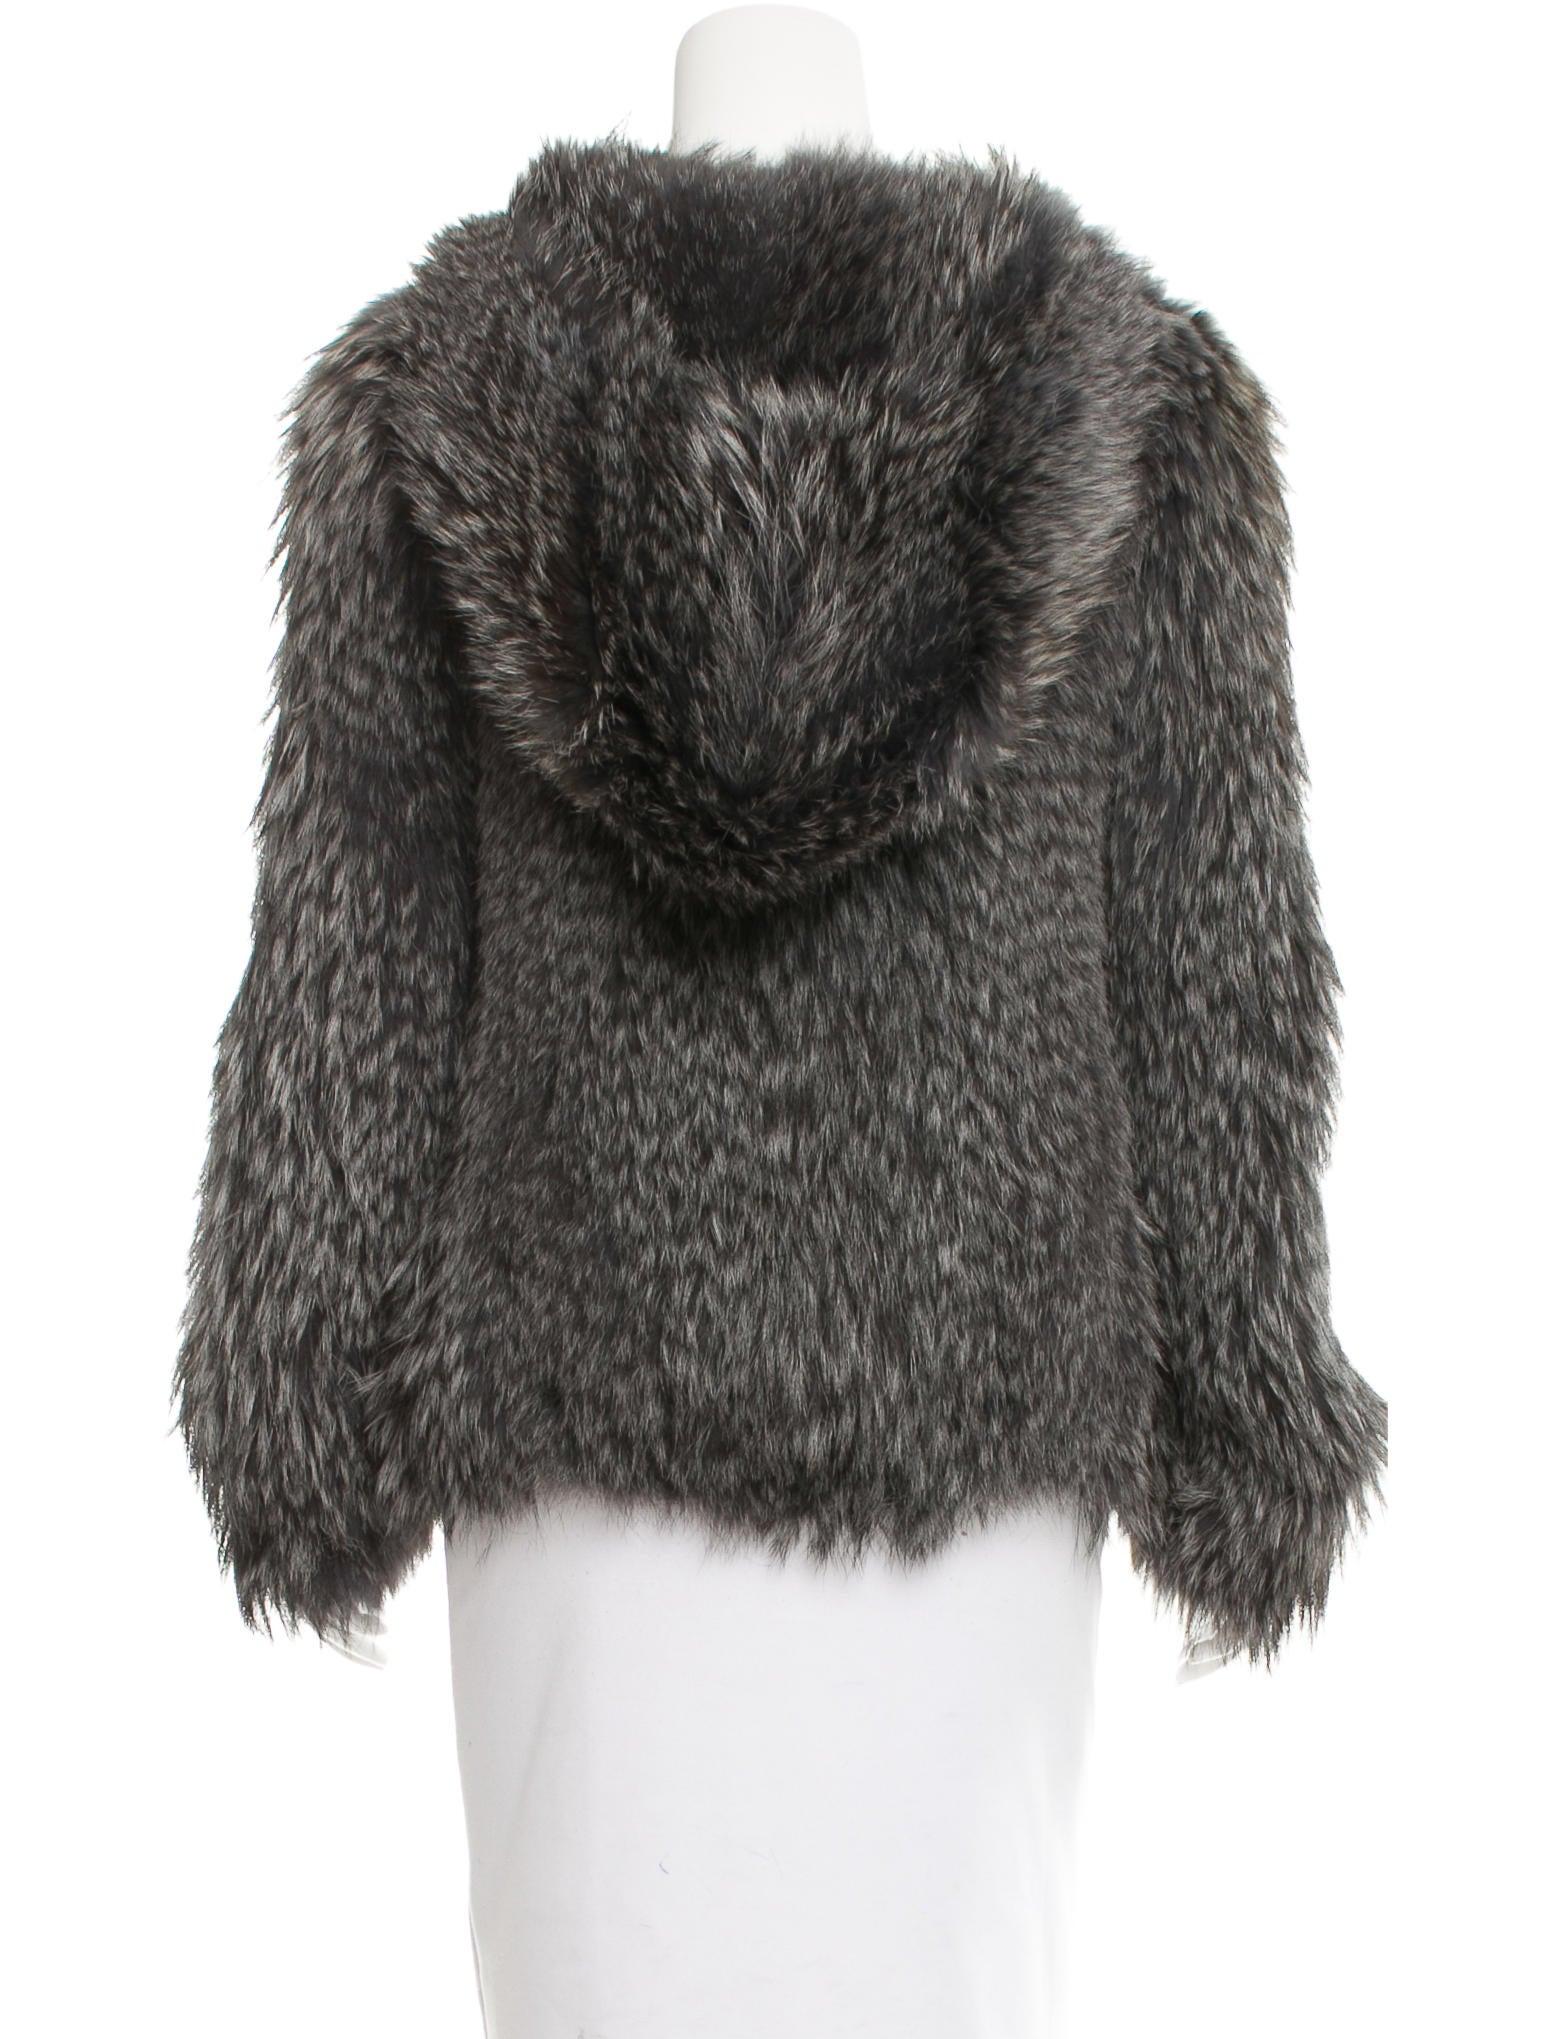 Prada Knitted Fox Fur Jacket - Clothing - PRA137570 The RealReal